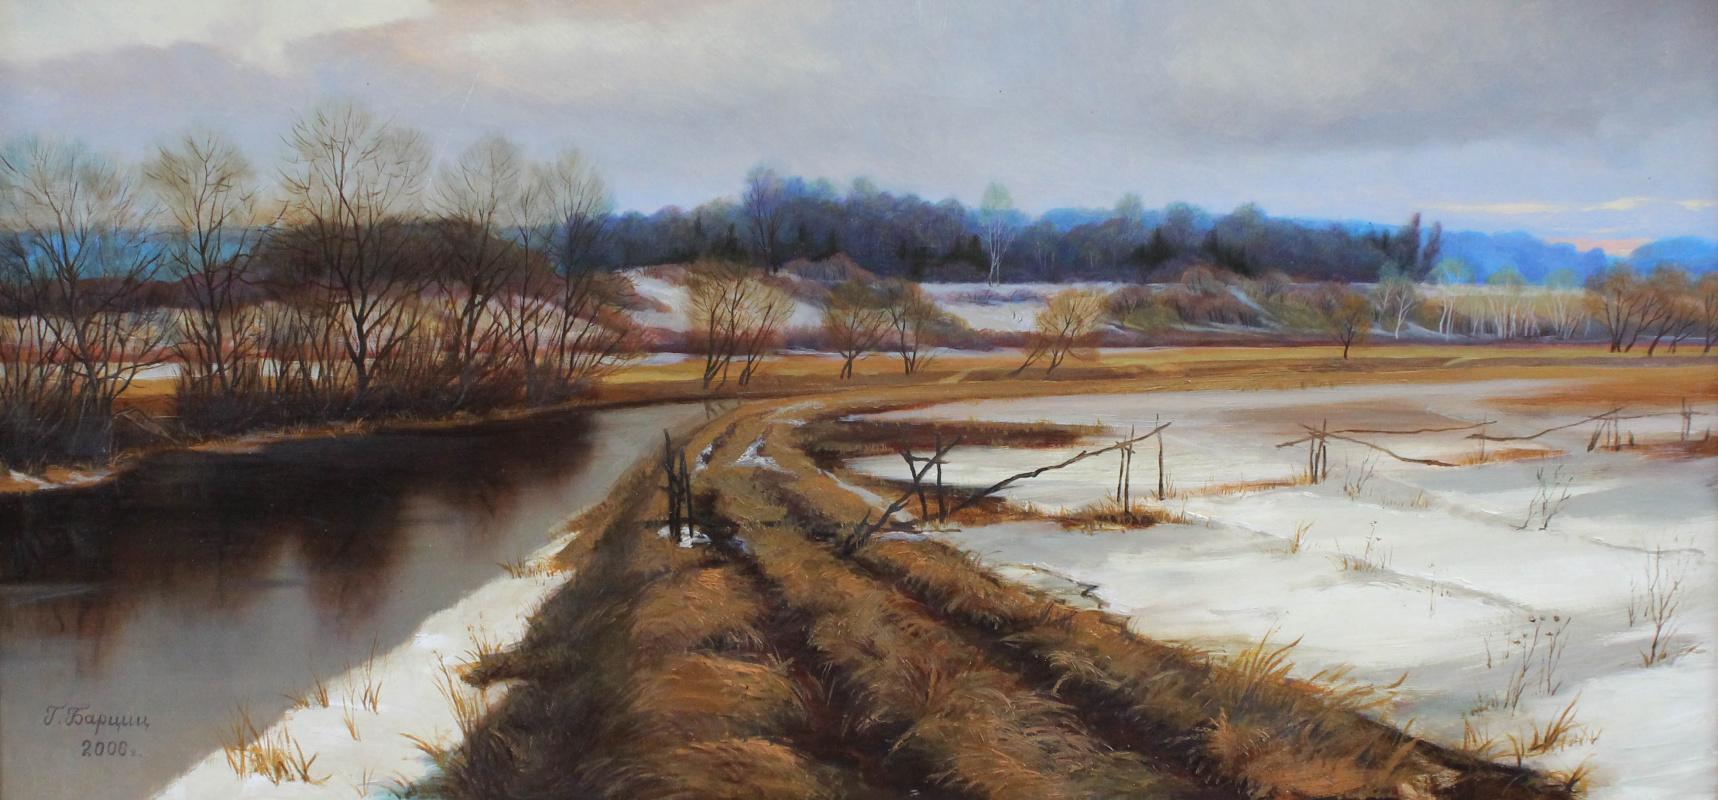 Gennady Shotovich Bartsits. Spring on the Ucha River